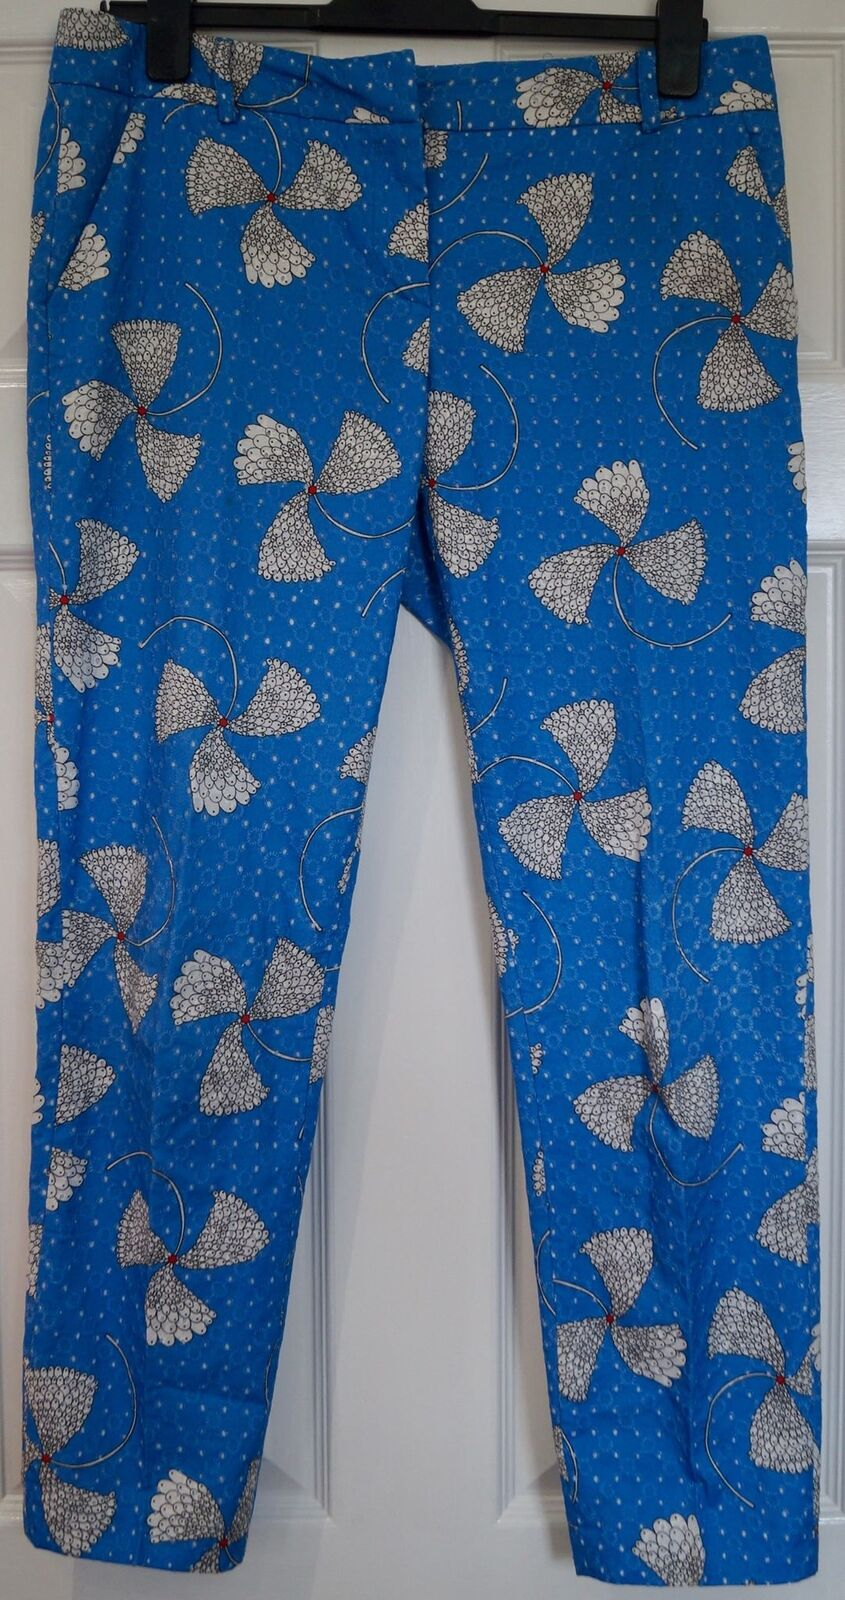 PAUL & JOE Royal bluee Cotton Floral Print Tapered Capri Crop Trousers Pants UK14